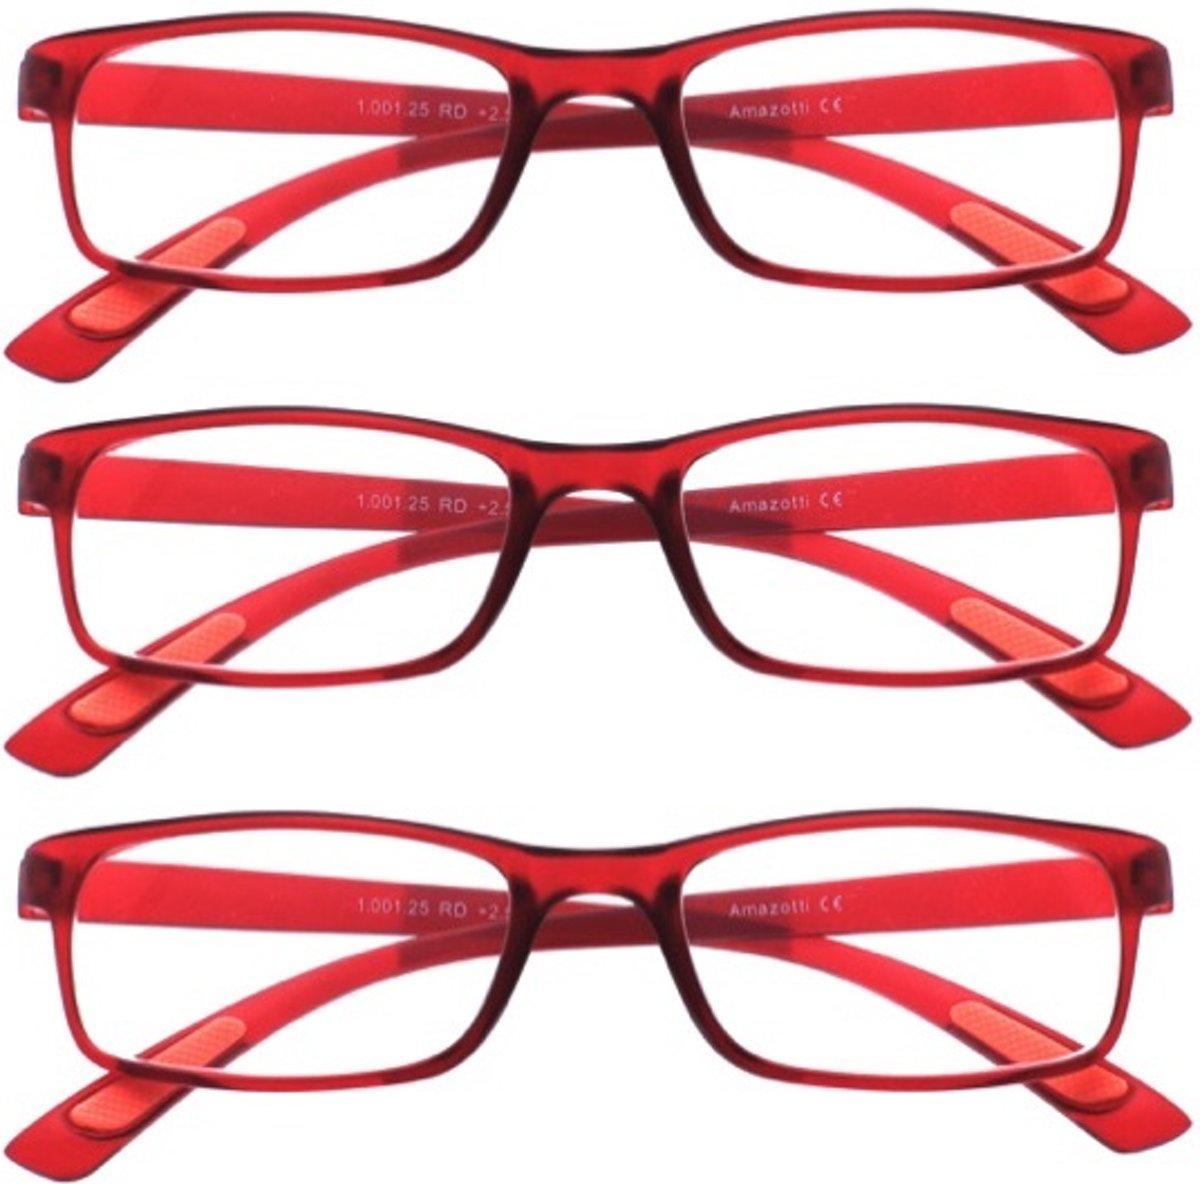 Amazotti Set van 3, Super-lichte Trendy Leesbril – rood - sterkte +1.50 kopen